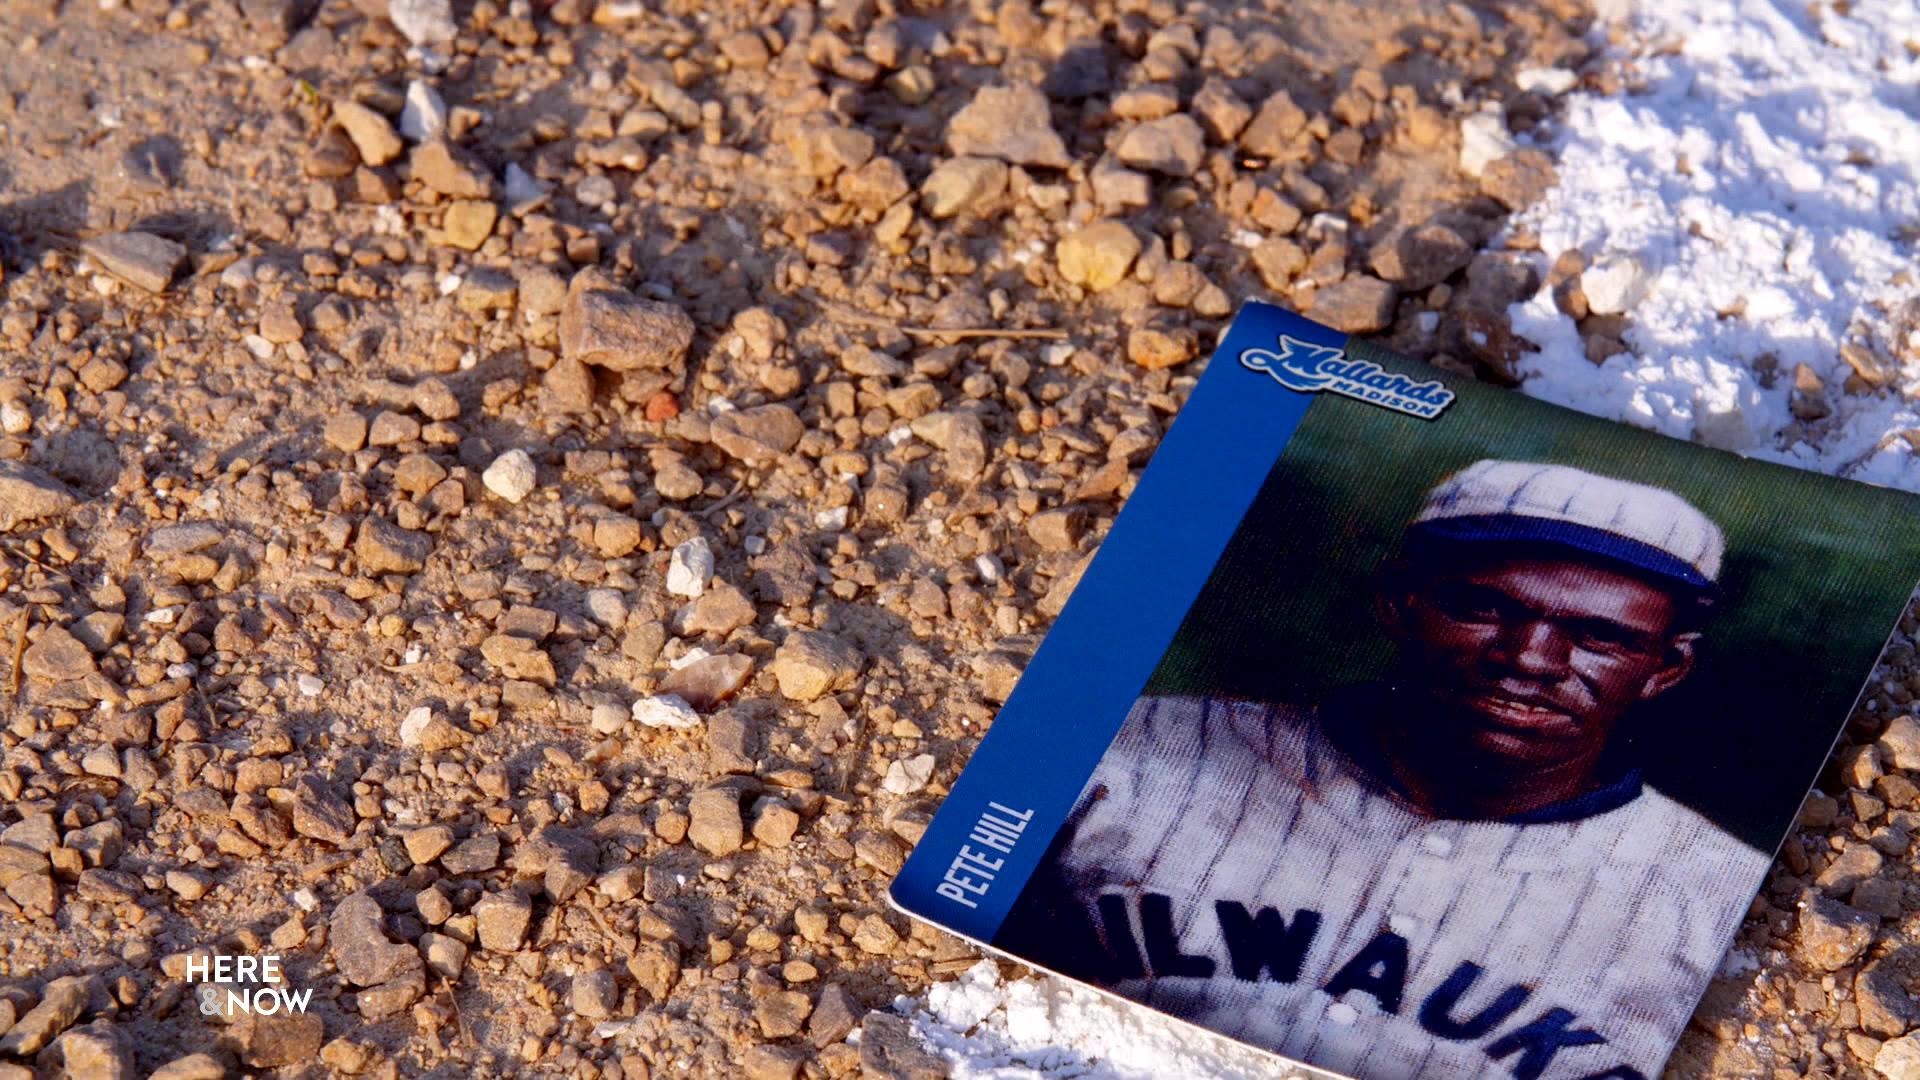 Madison Mallards promotional baseball card of Pete Hill on fair/foul line marker